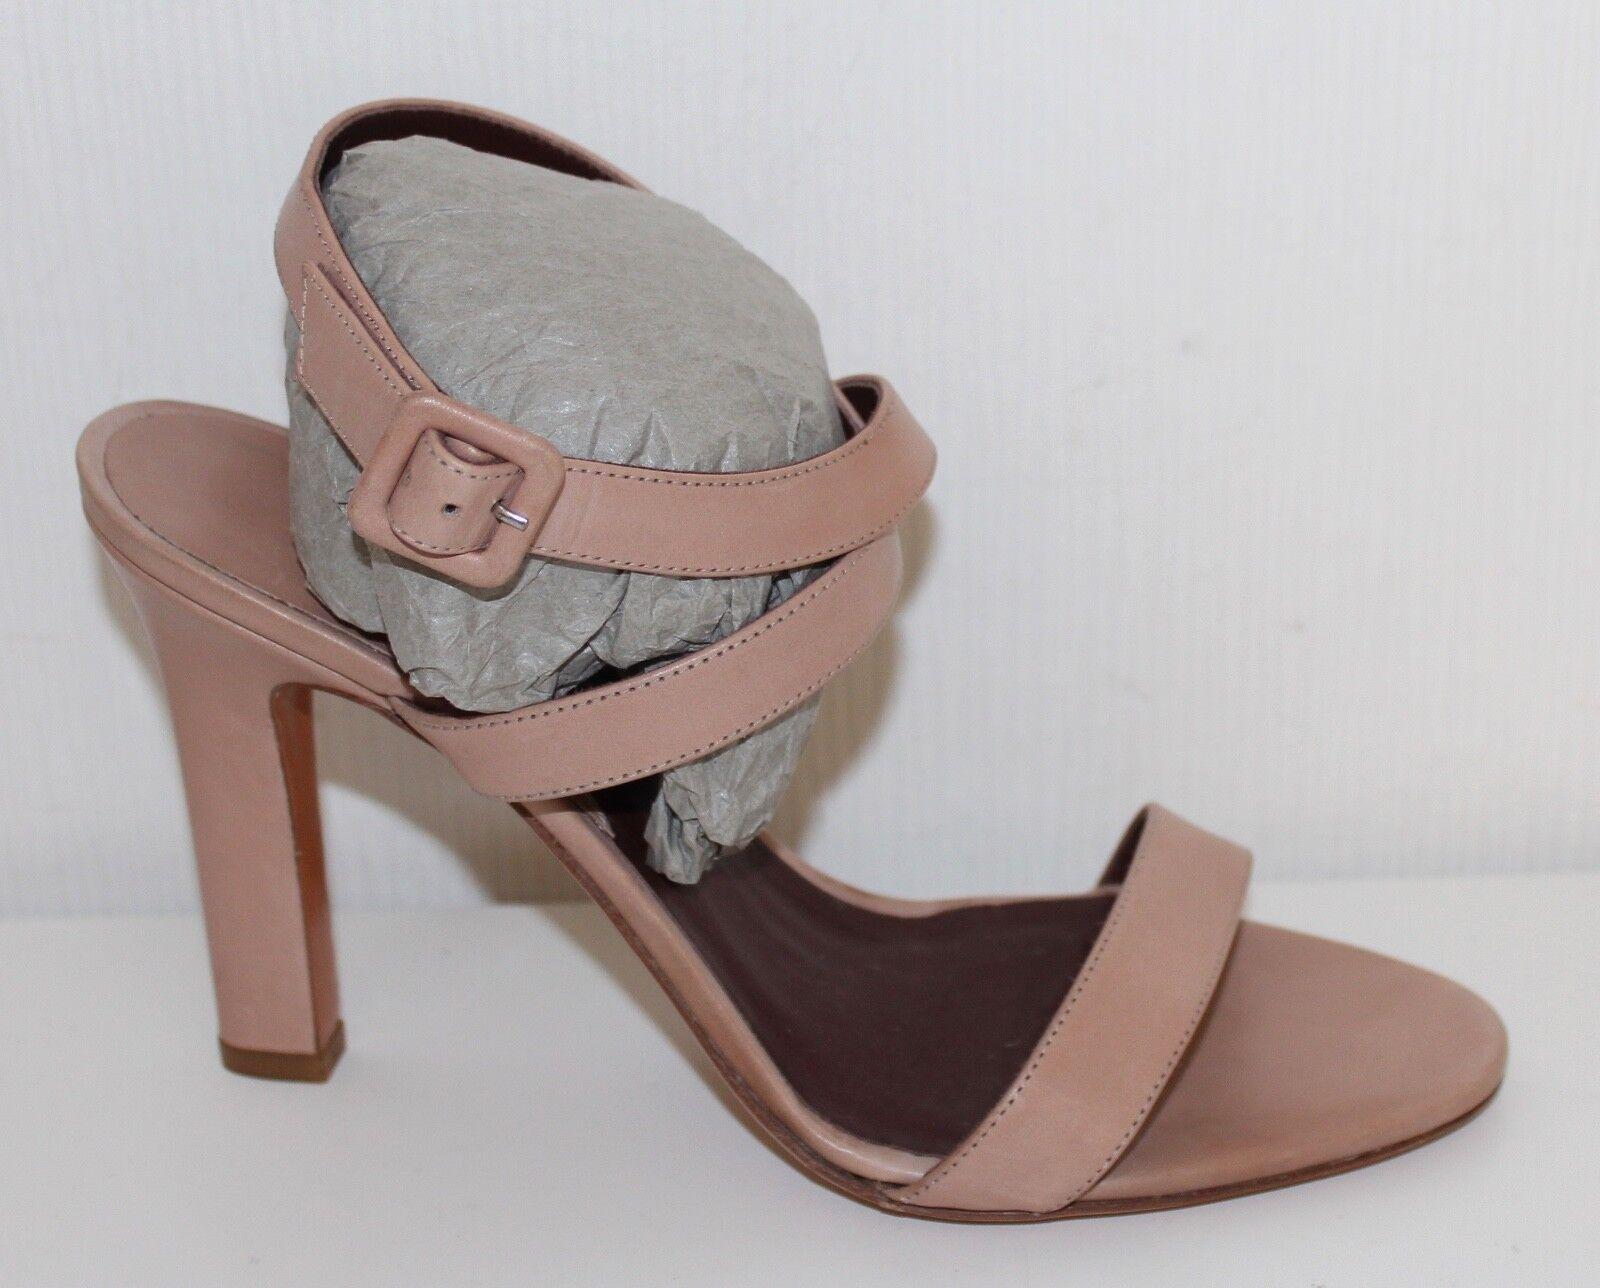 Bruno Magli sandalias de cuero con tiras sandalias 39 Leather sandals nude tacón alto